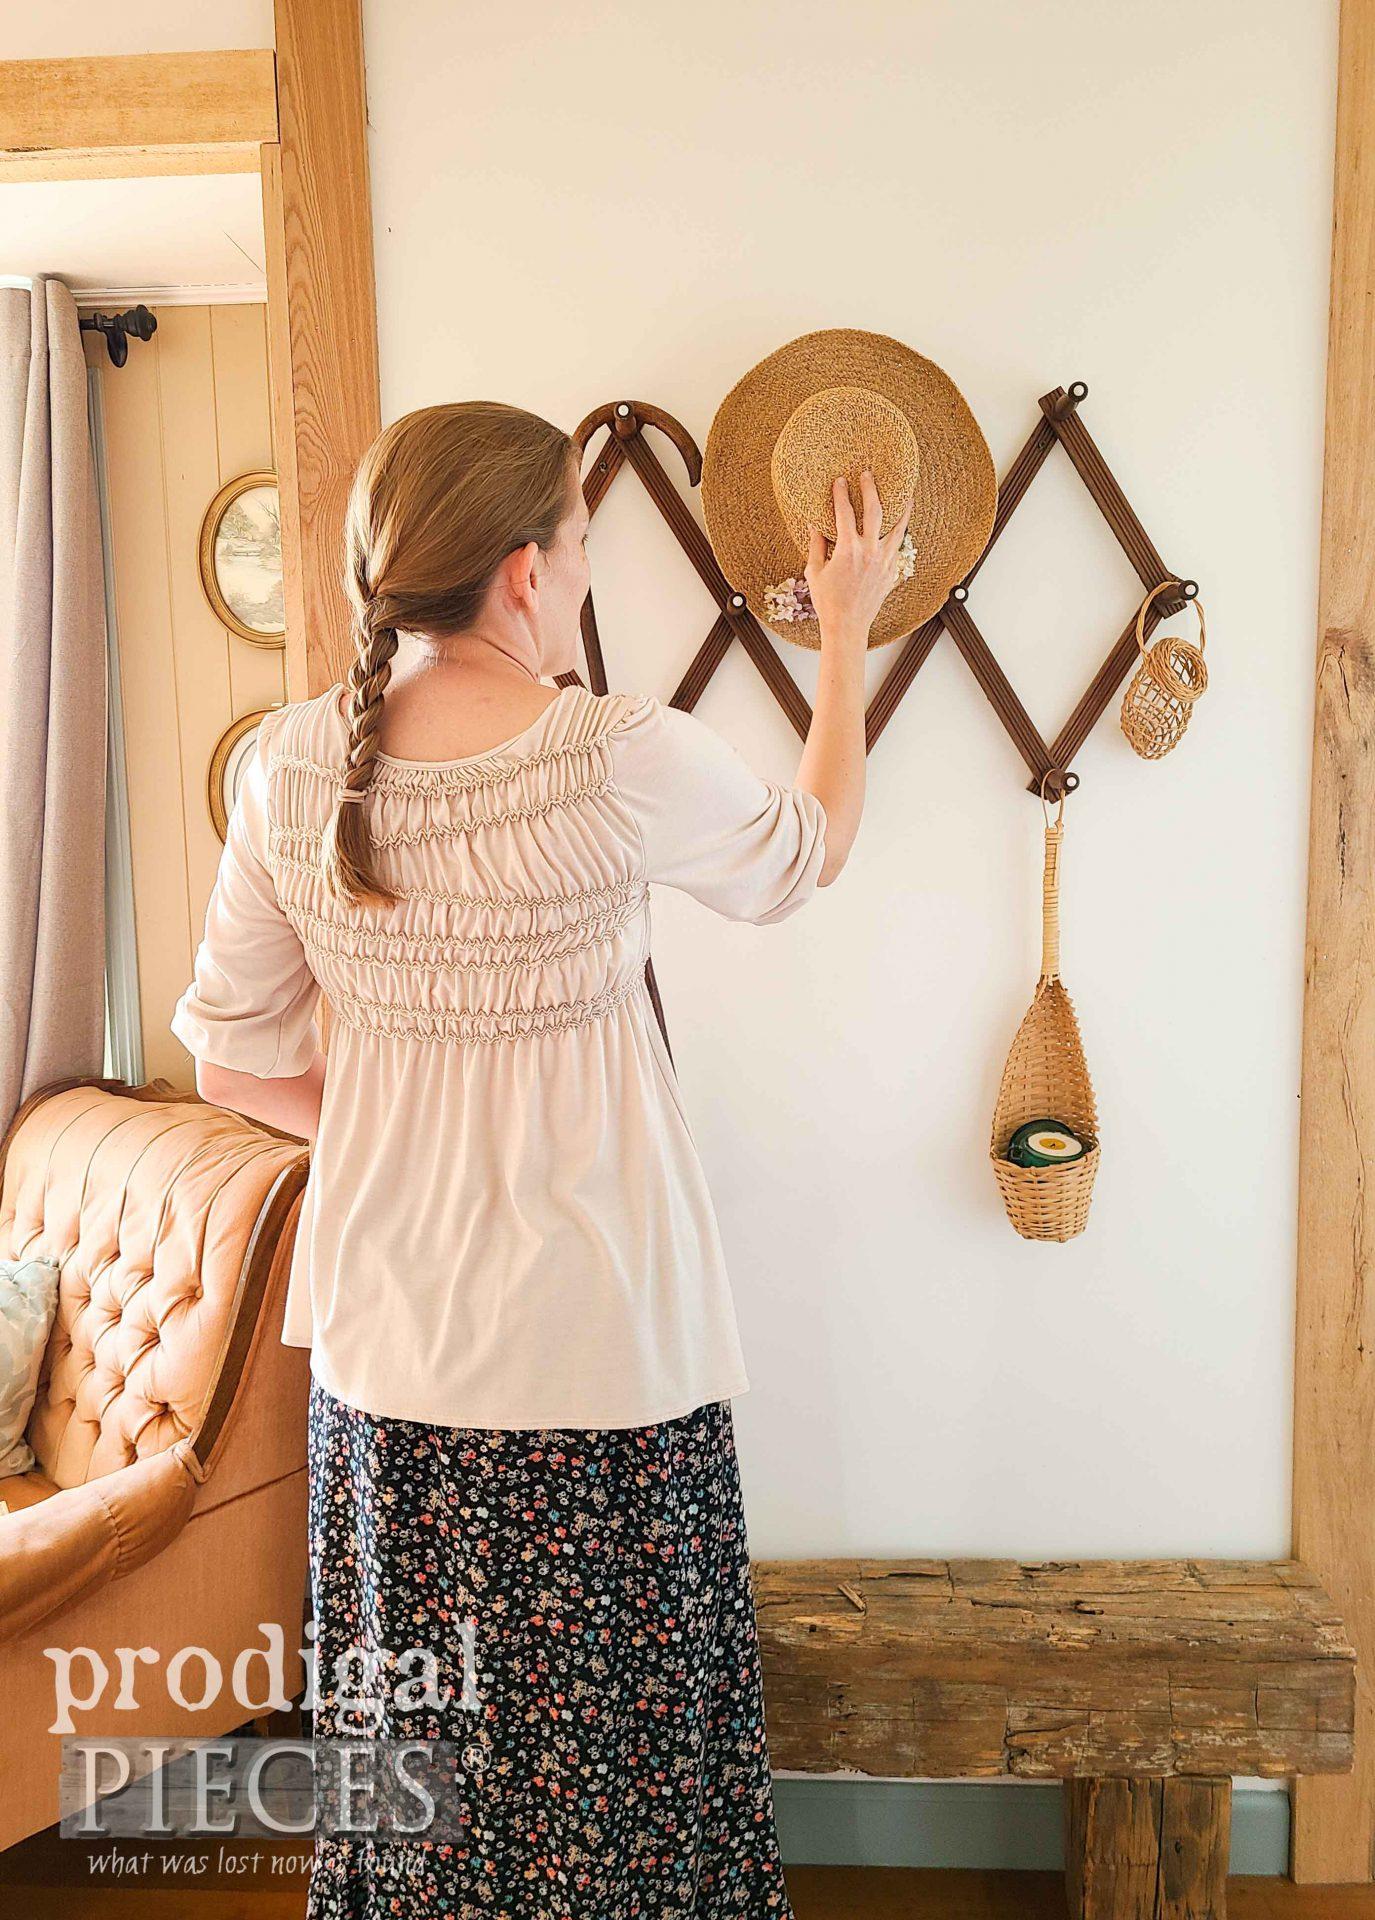 Larissa of Prodigal Pieces Hanging Straw Hat | prodigalpieces.com #prodigalpieces #home #farmhouse #homedecor